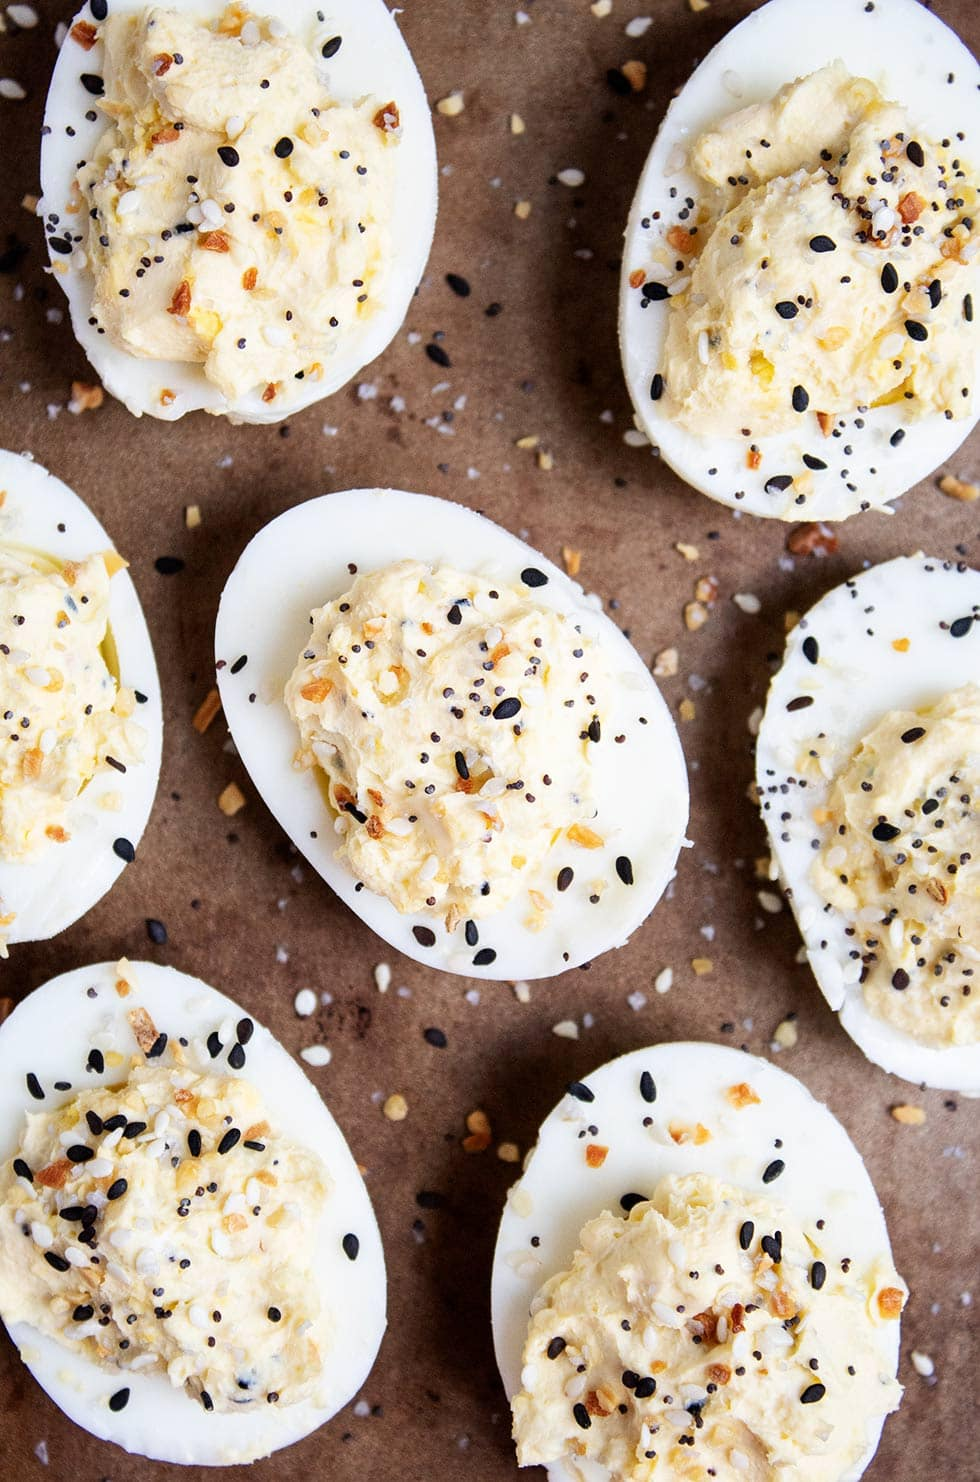 aerial view of keto deviled eggs cut in half and sprinkled with everything bagel seasoning